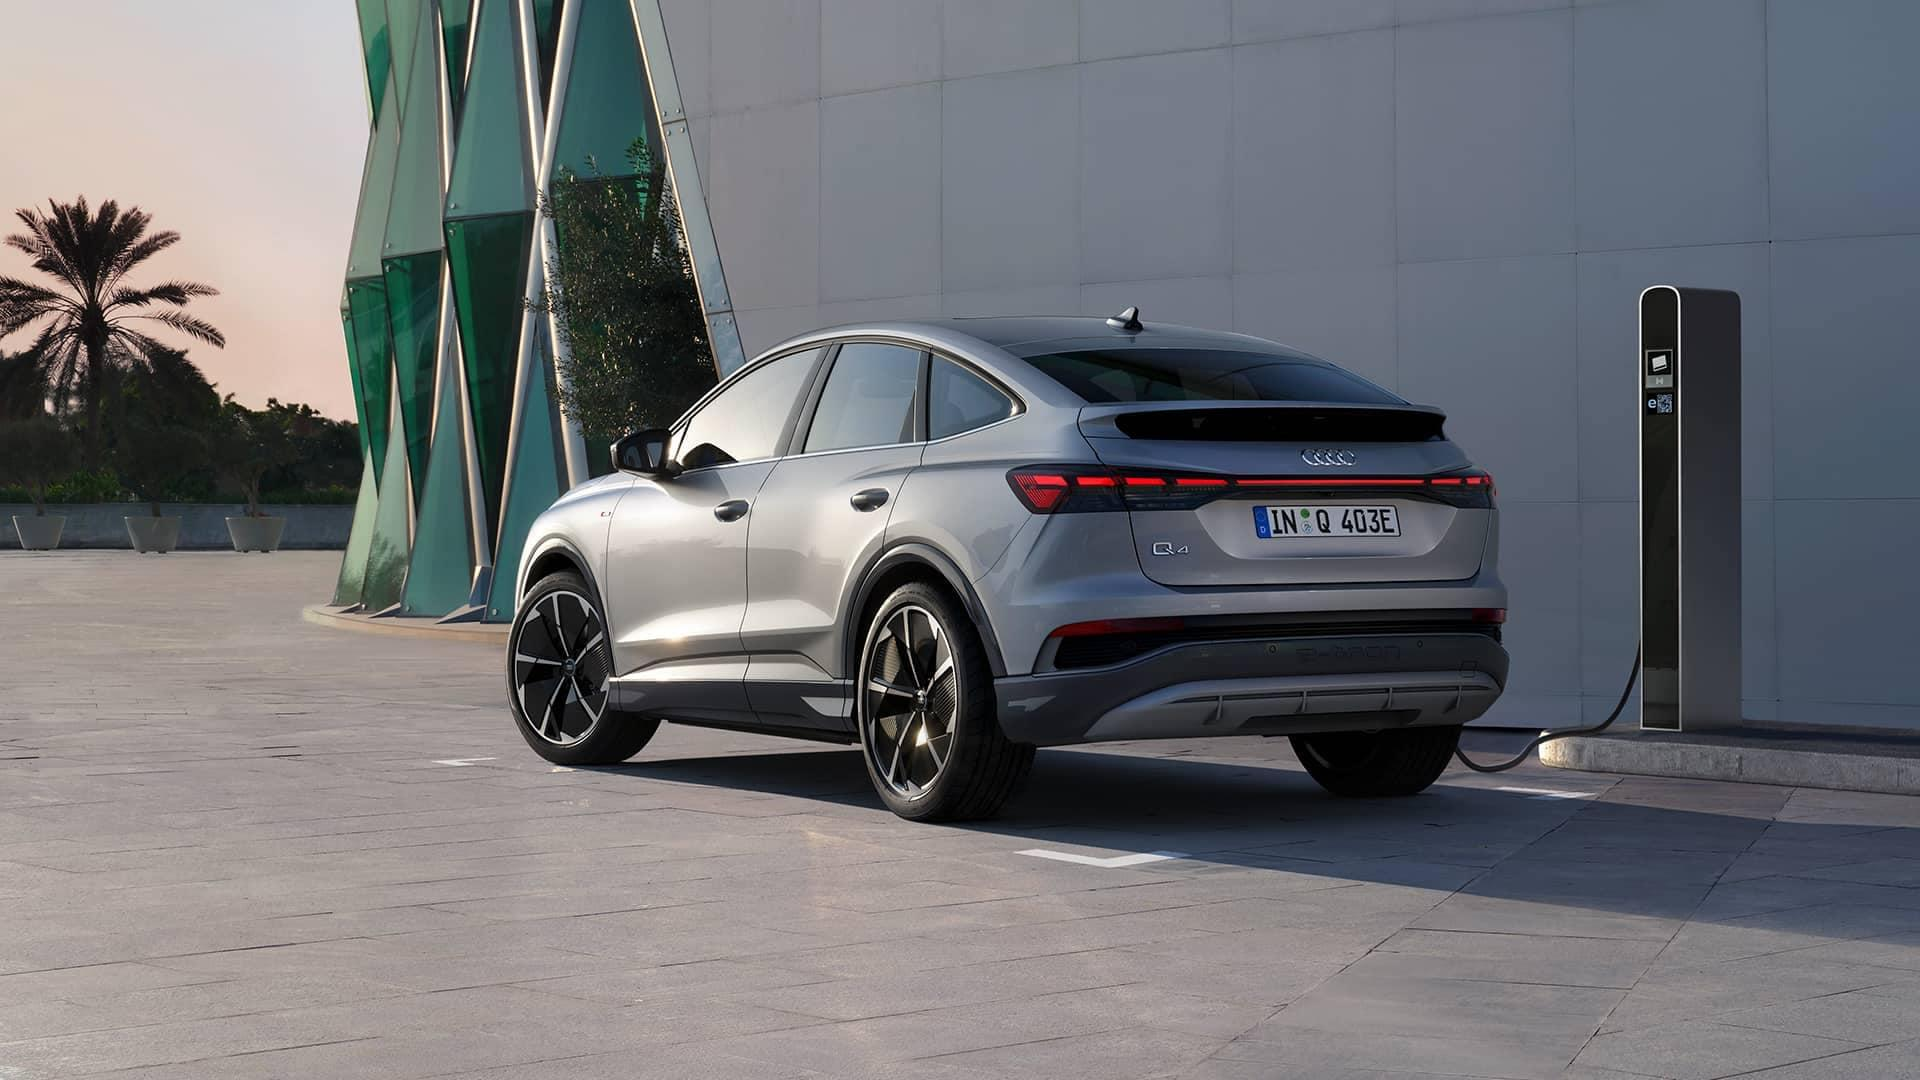 Audi Uptown Q4 e-tron Sportback